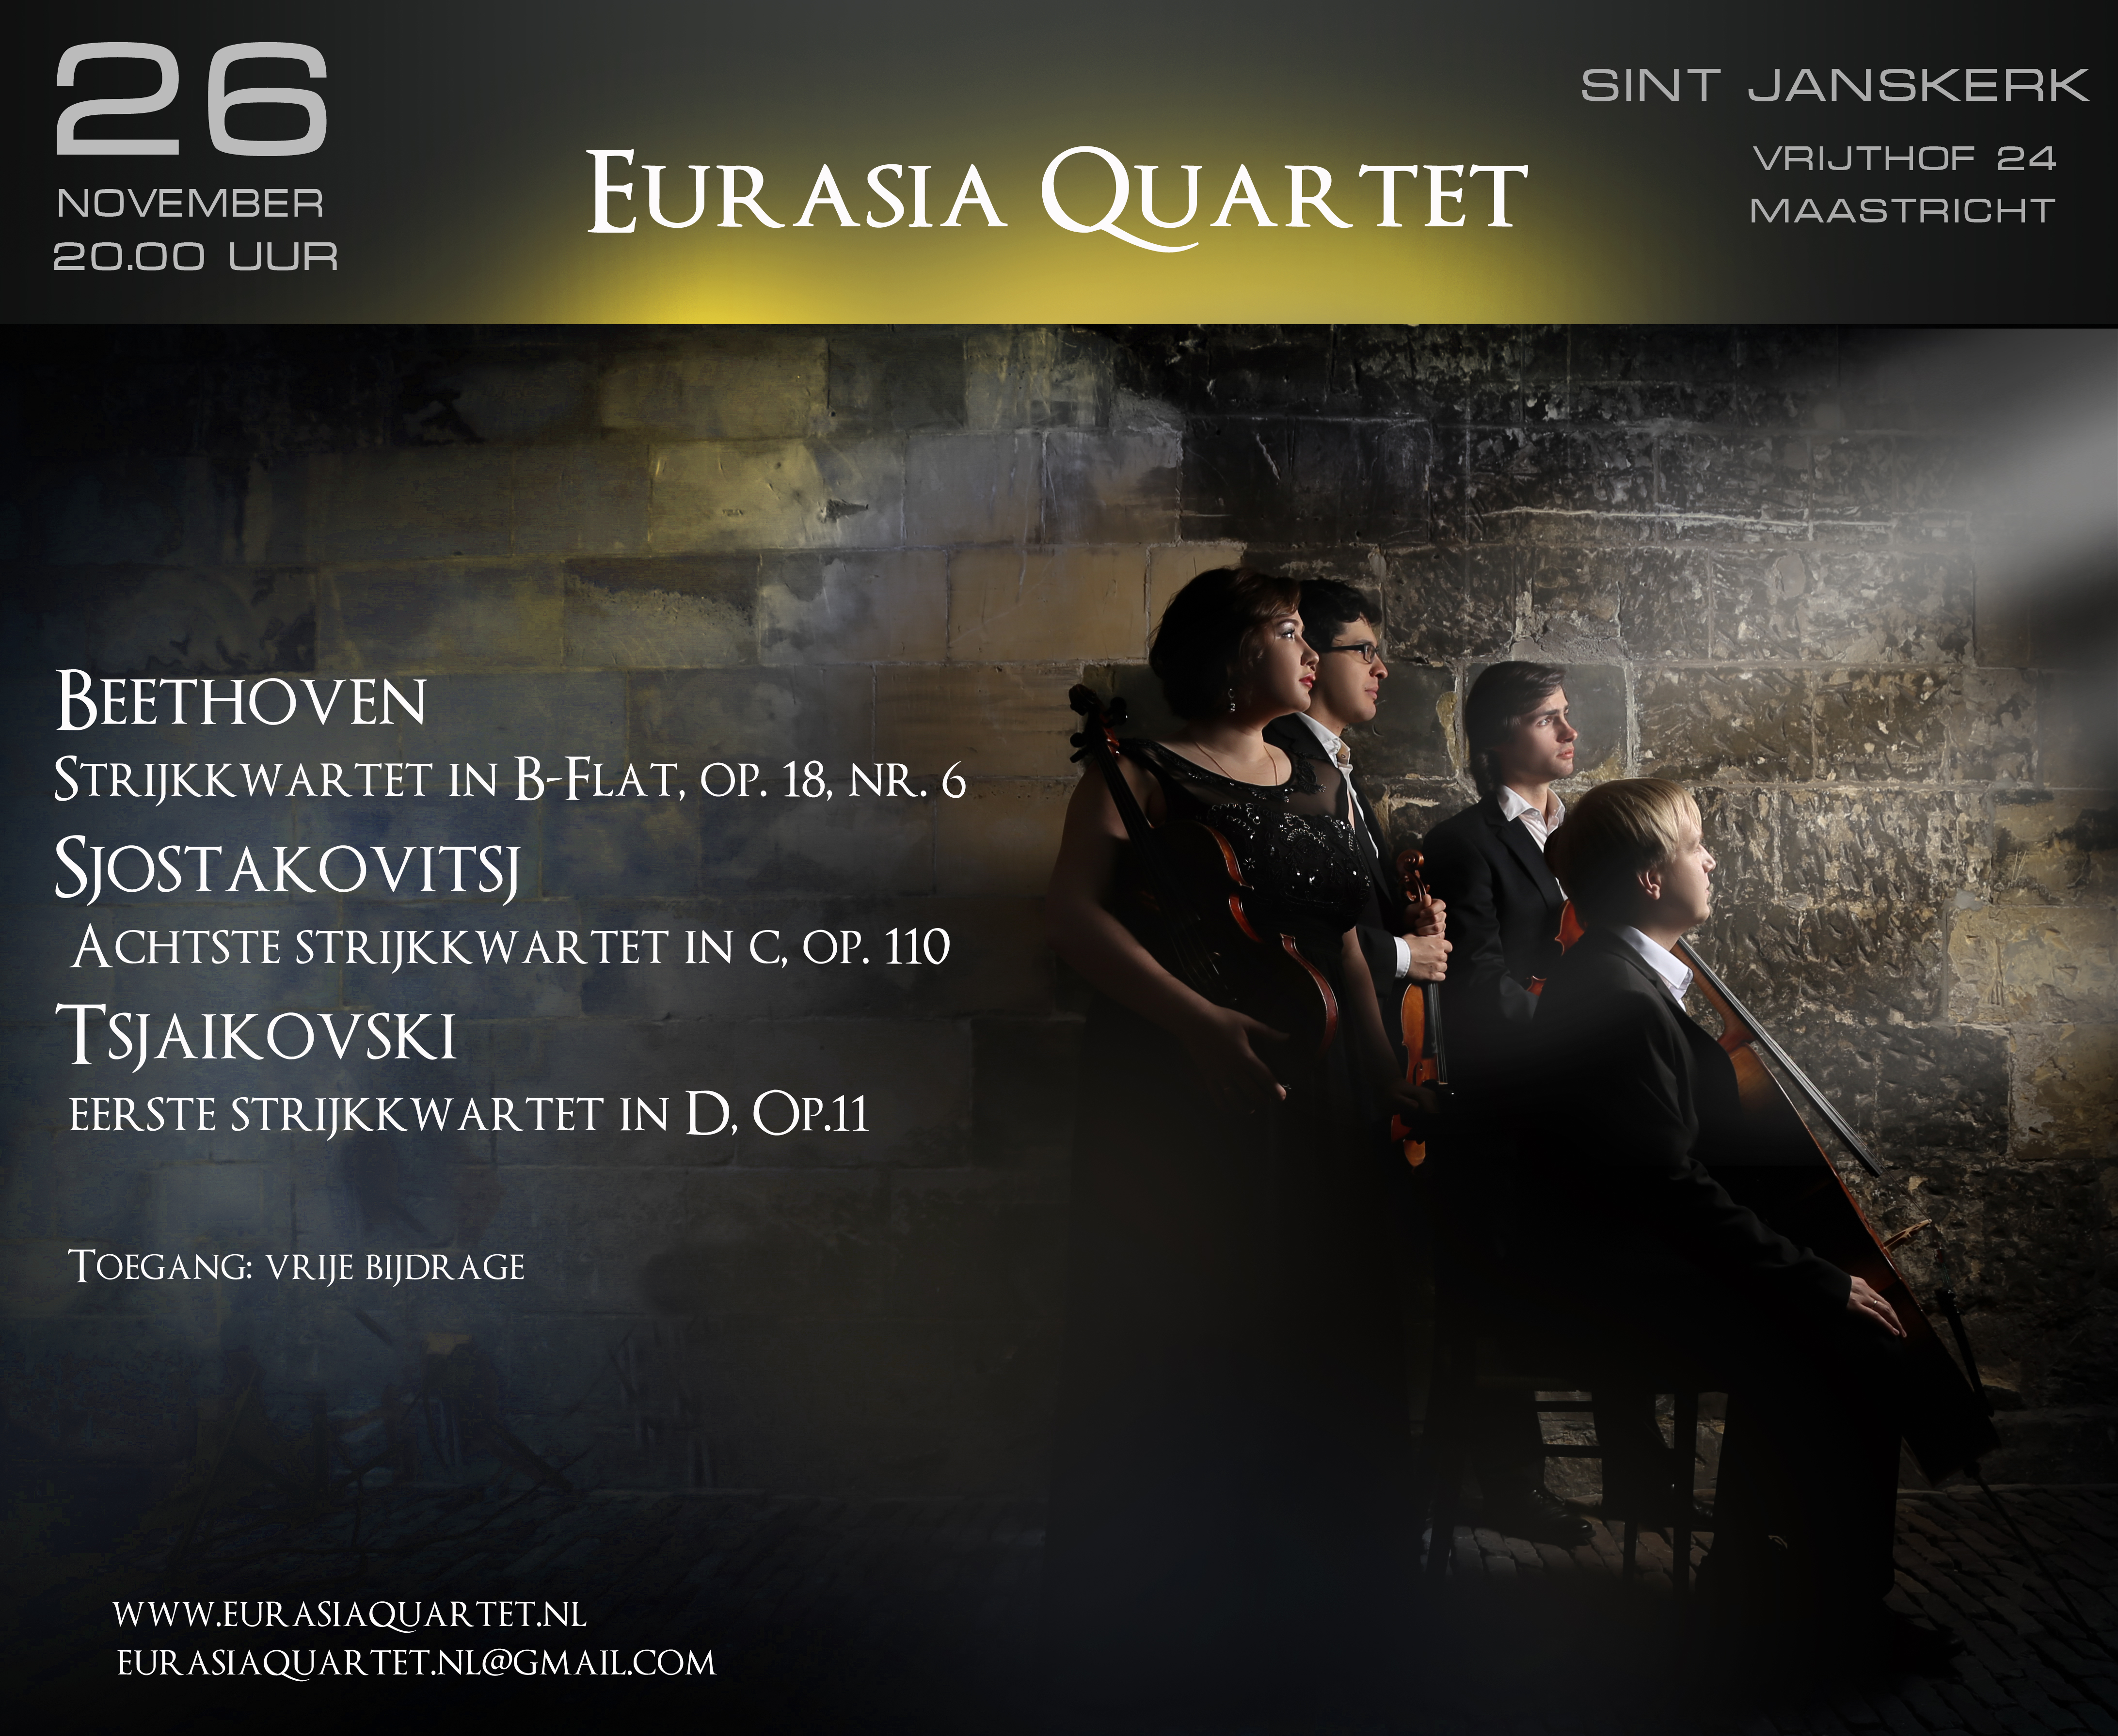 eurasia-quartet-poster